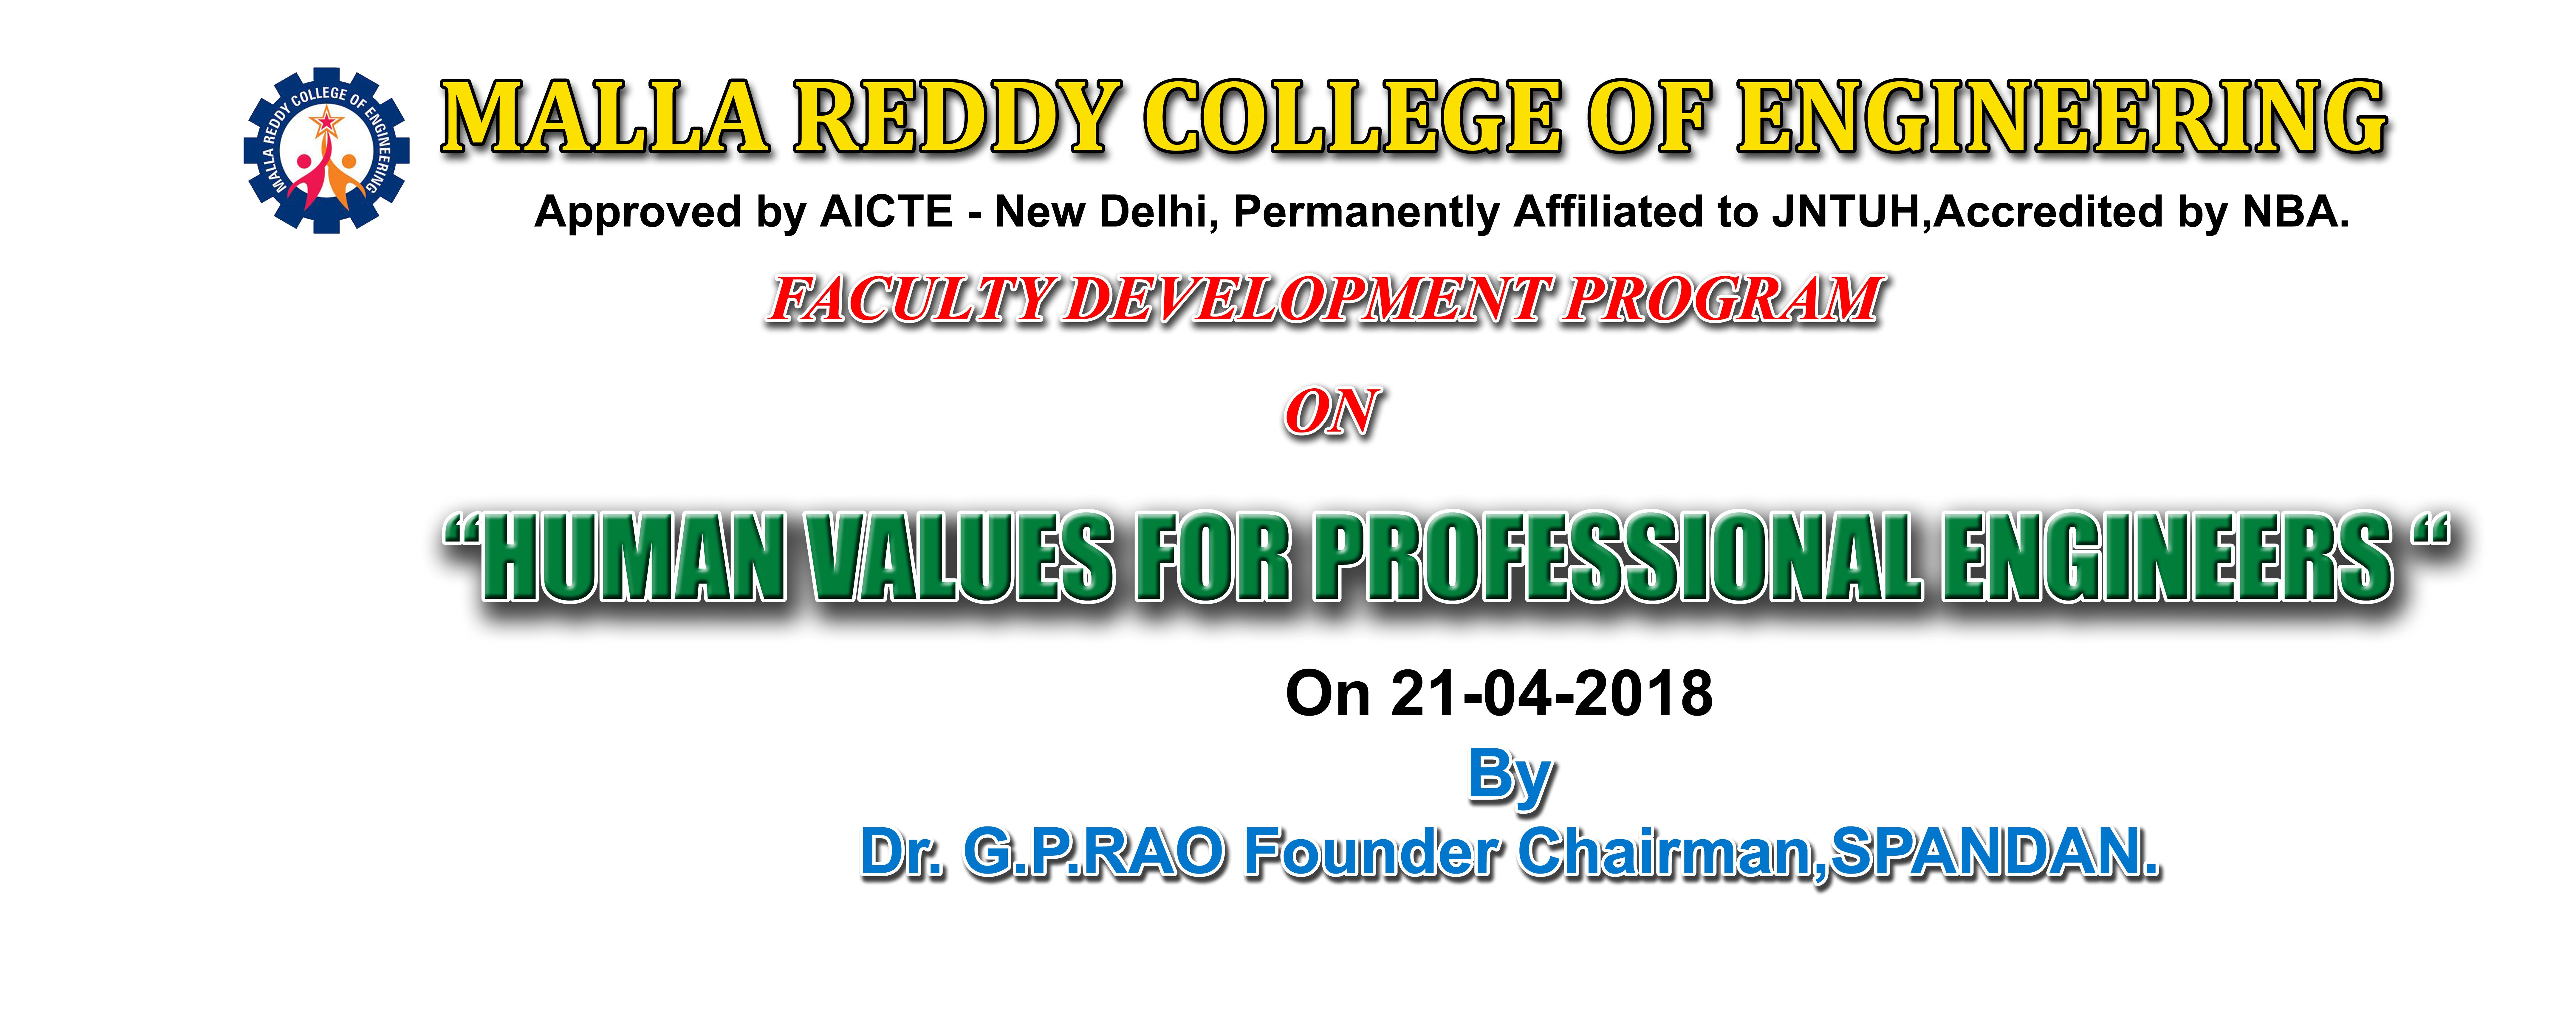 Malla Reddy College of Engineering :